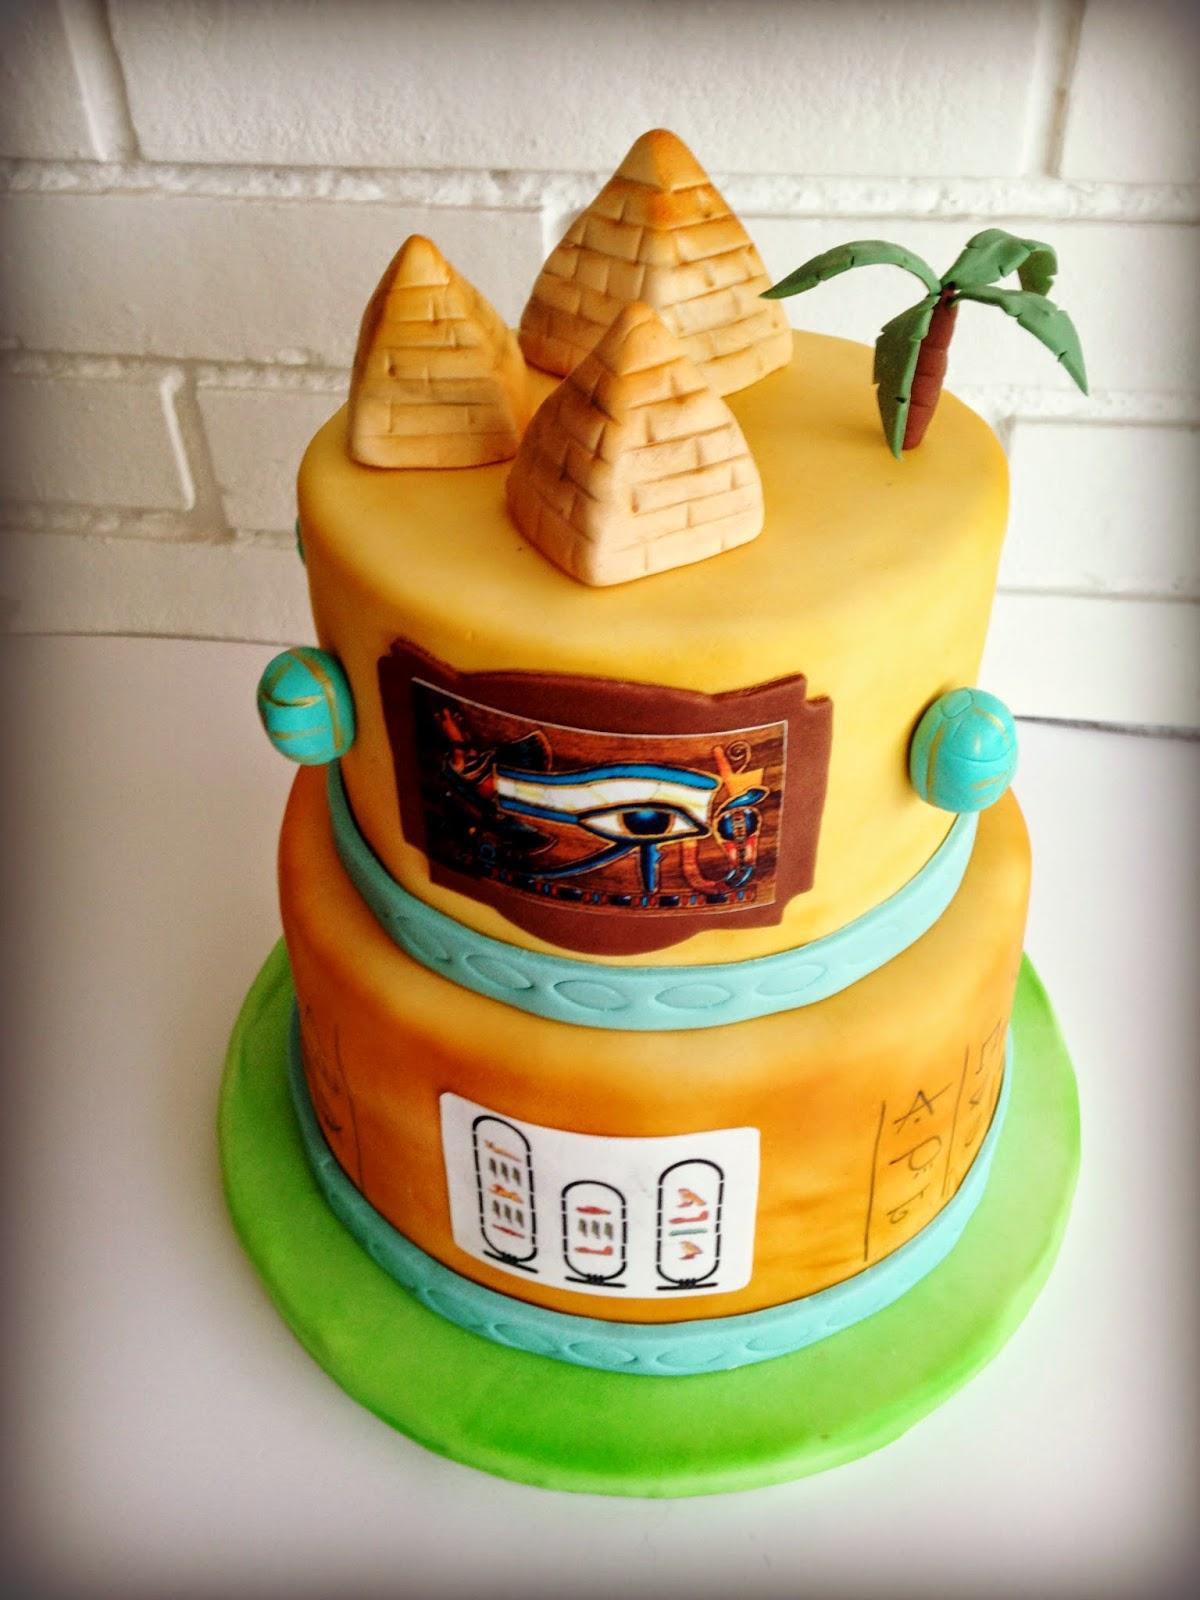 egipt cake